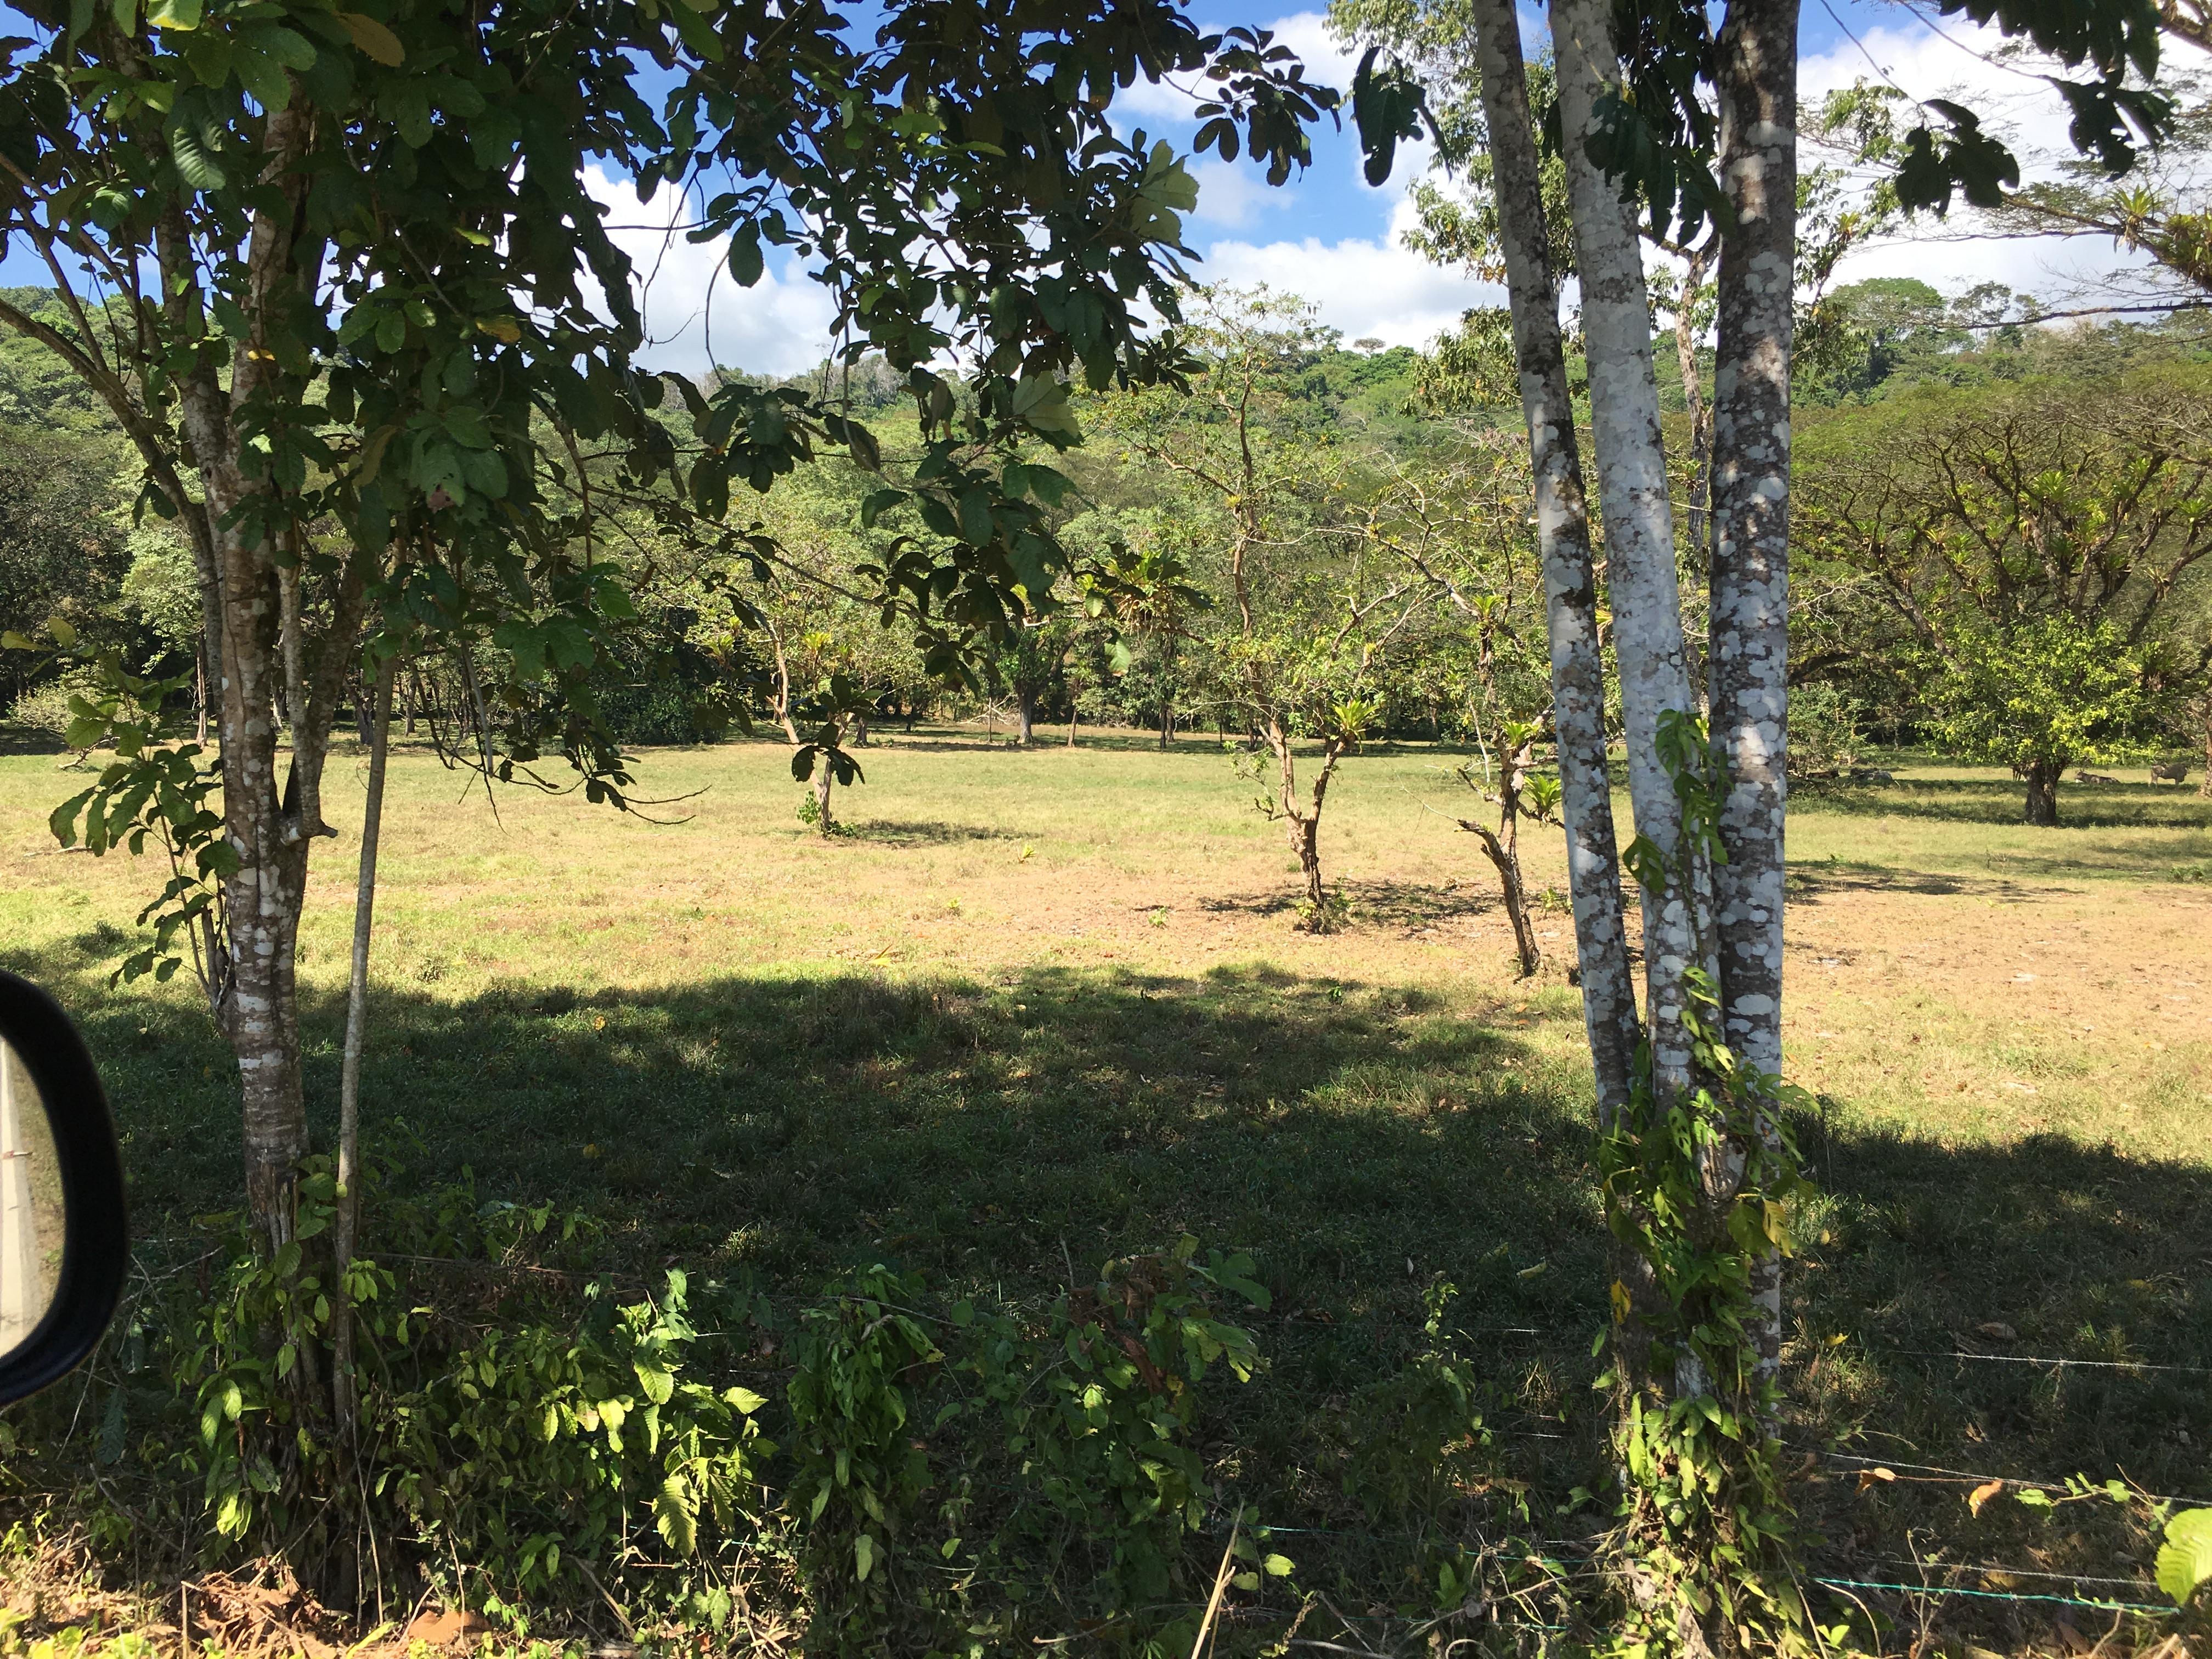 Dominical-Costa-Rica-property-costaricarealestateDOM331-3.jpg